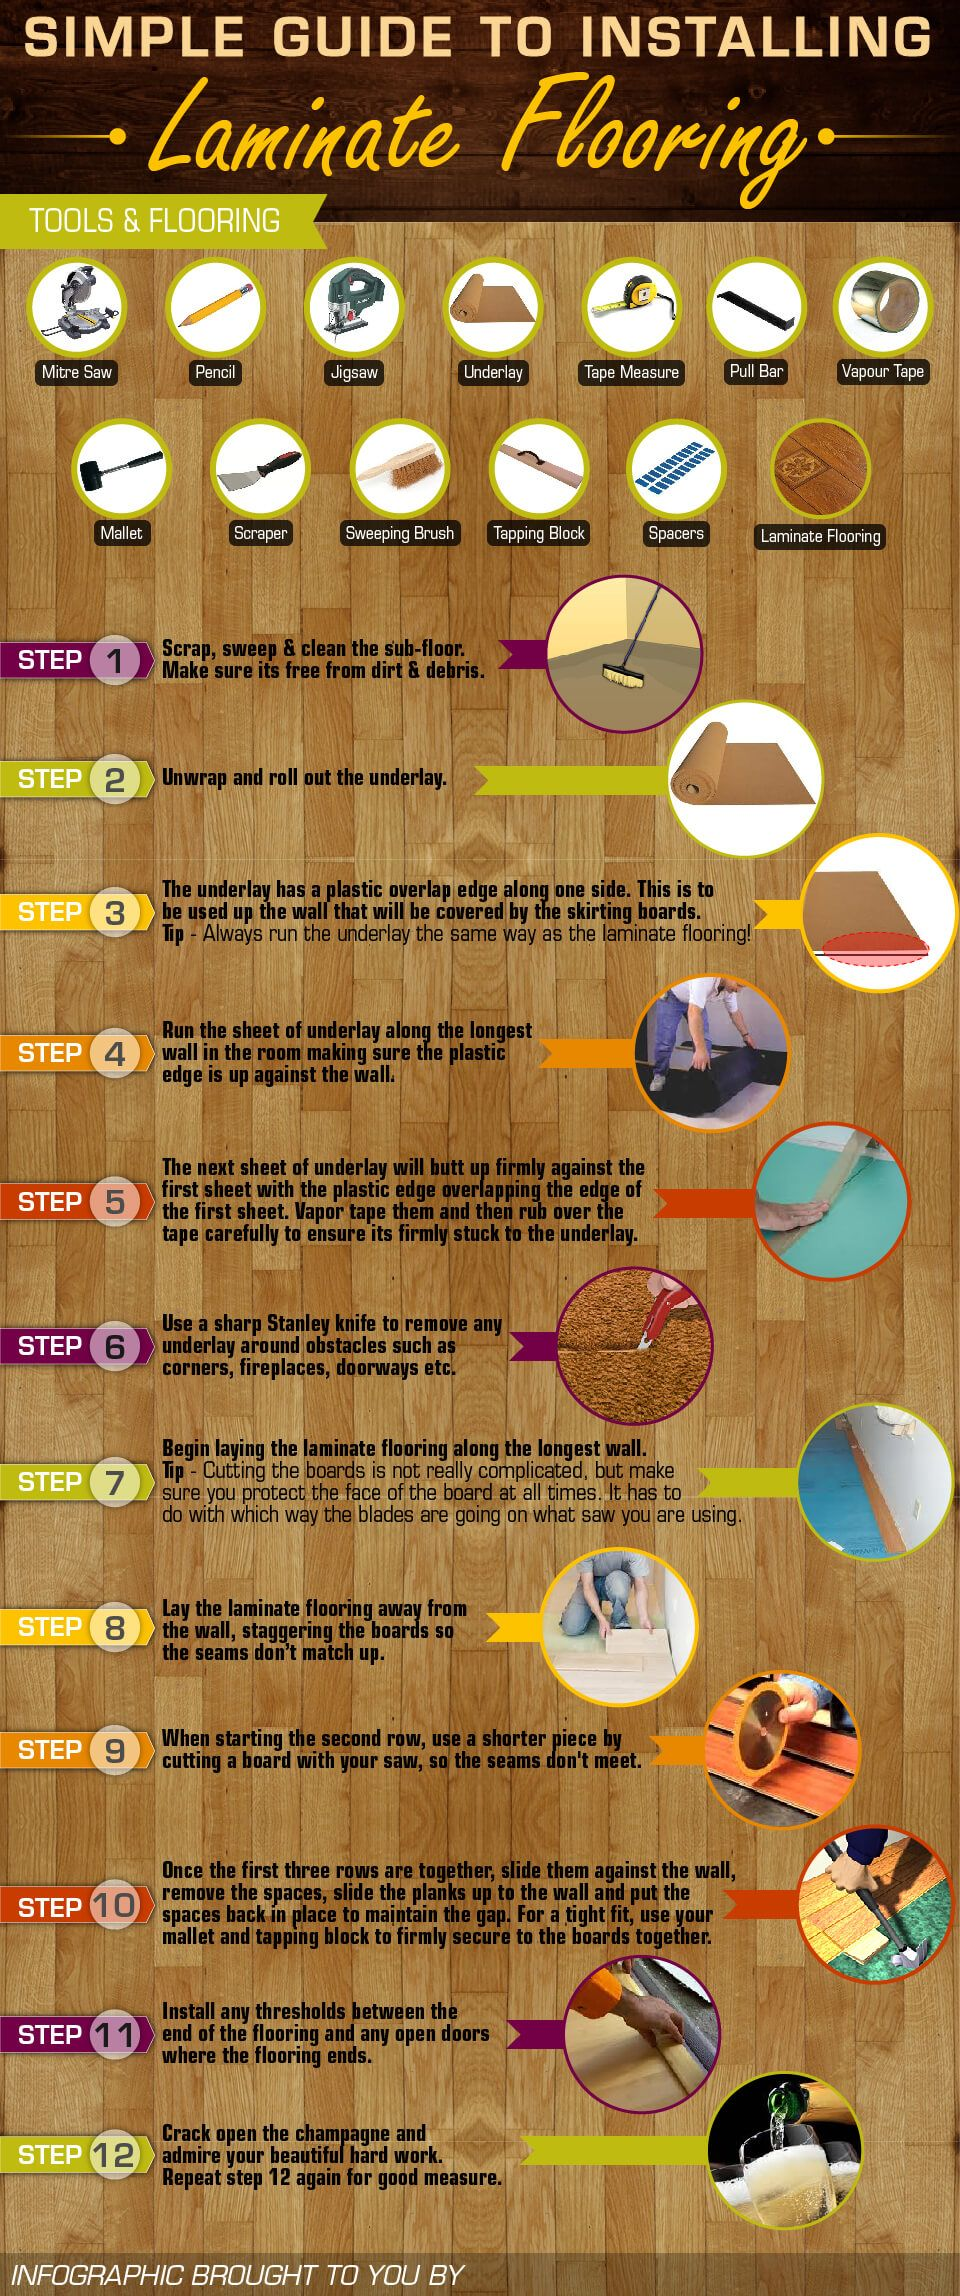 Laminate Flooring Simple Guide Process Infographic Laminate Flooring Installing Laminate Flooring Laminate